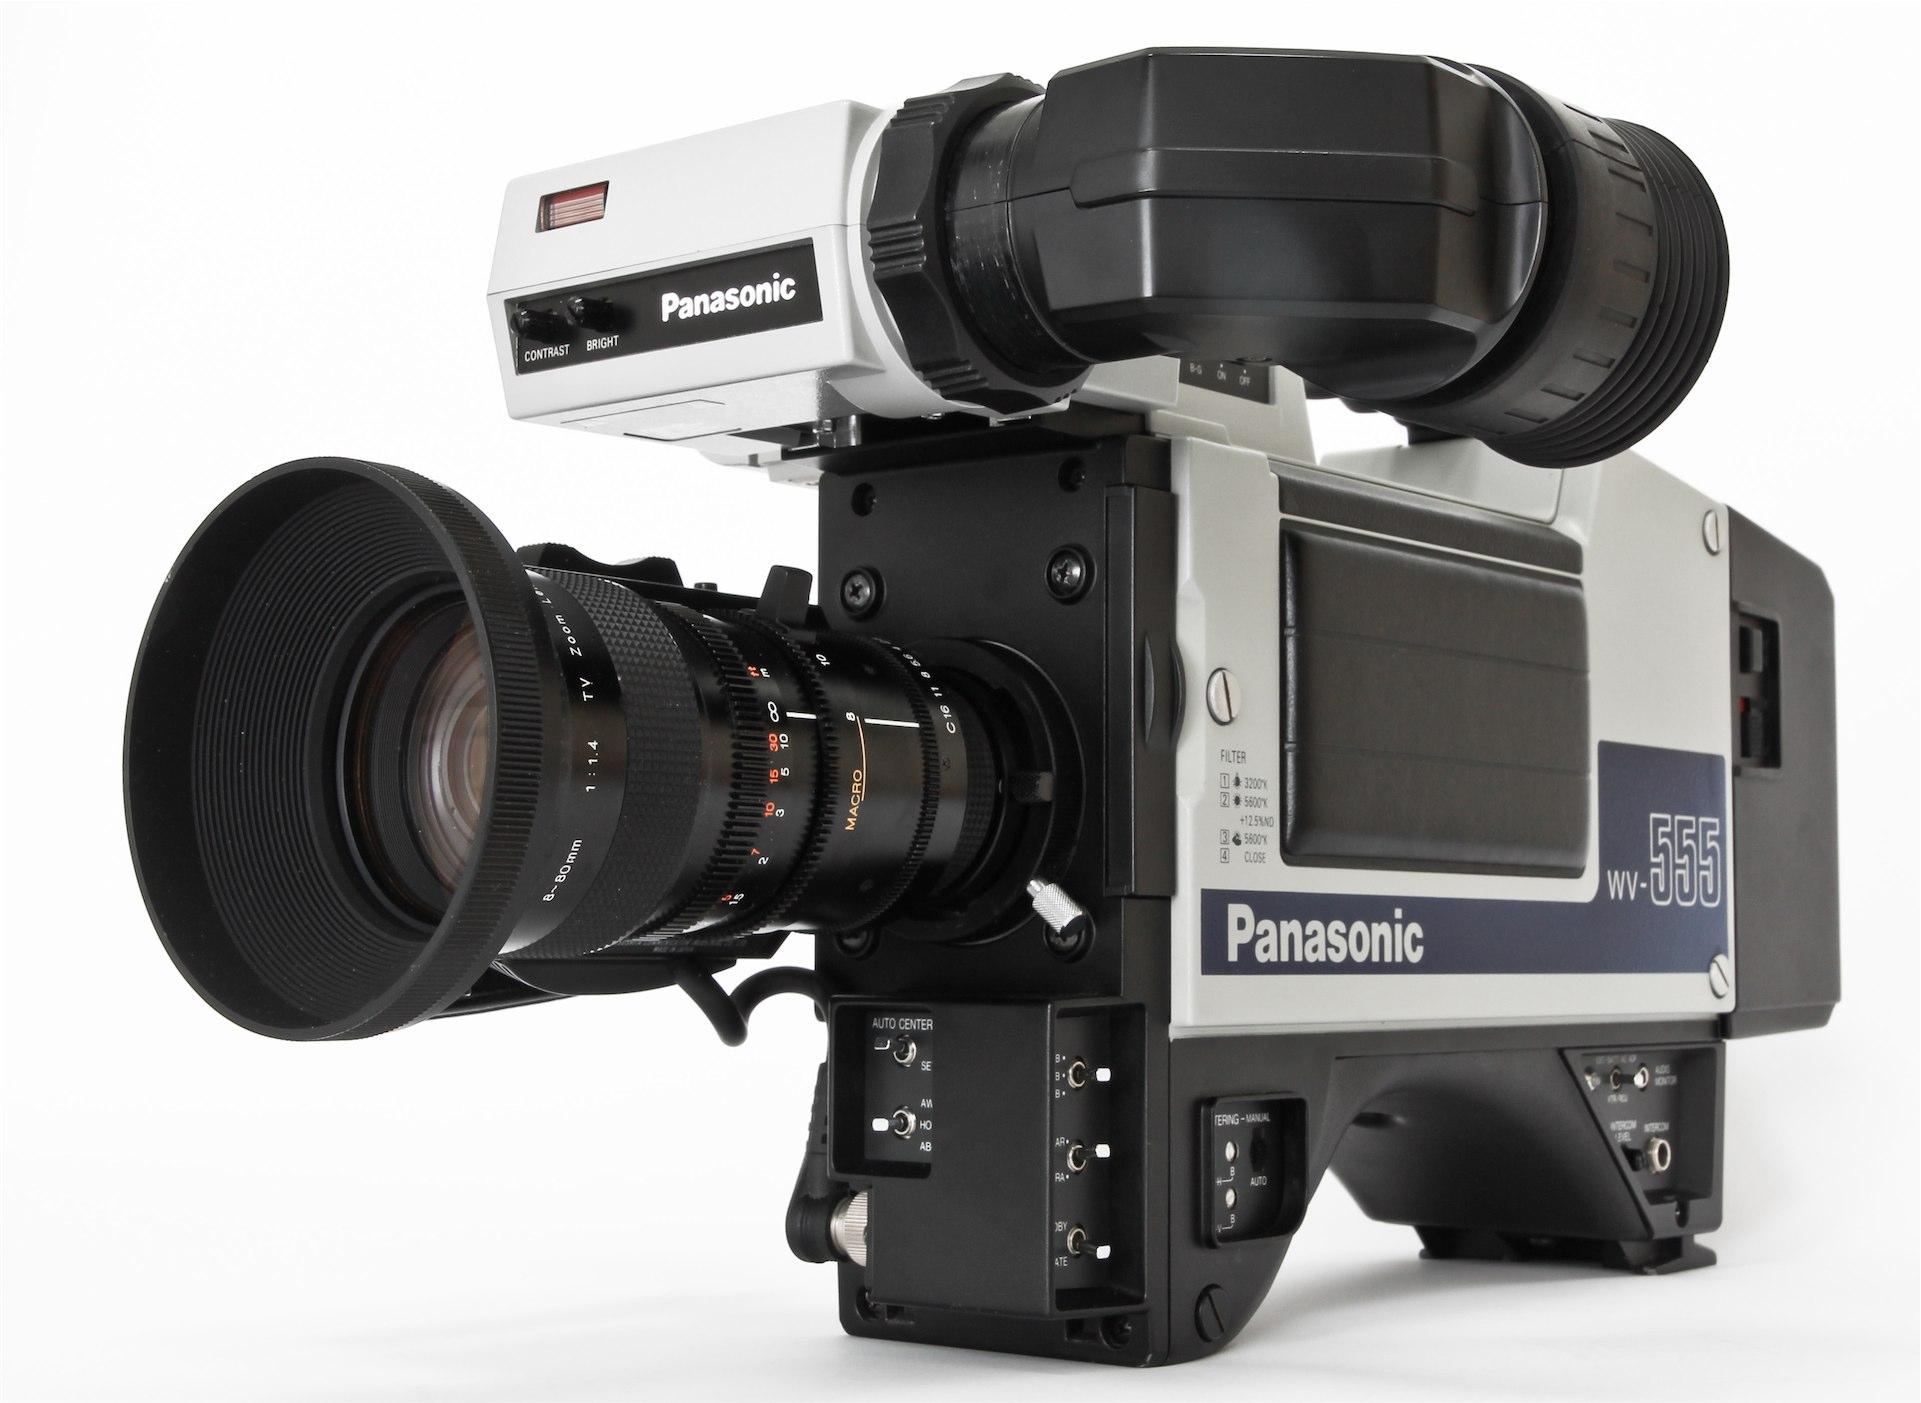 Panasonic WV-555 -  (15 von 19)_1